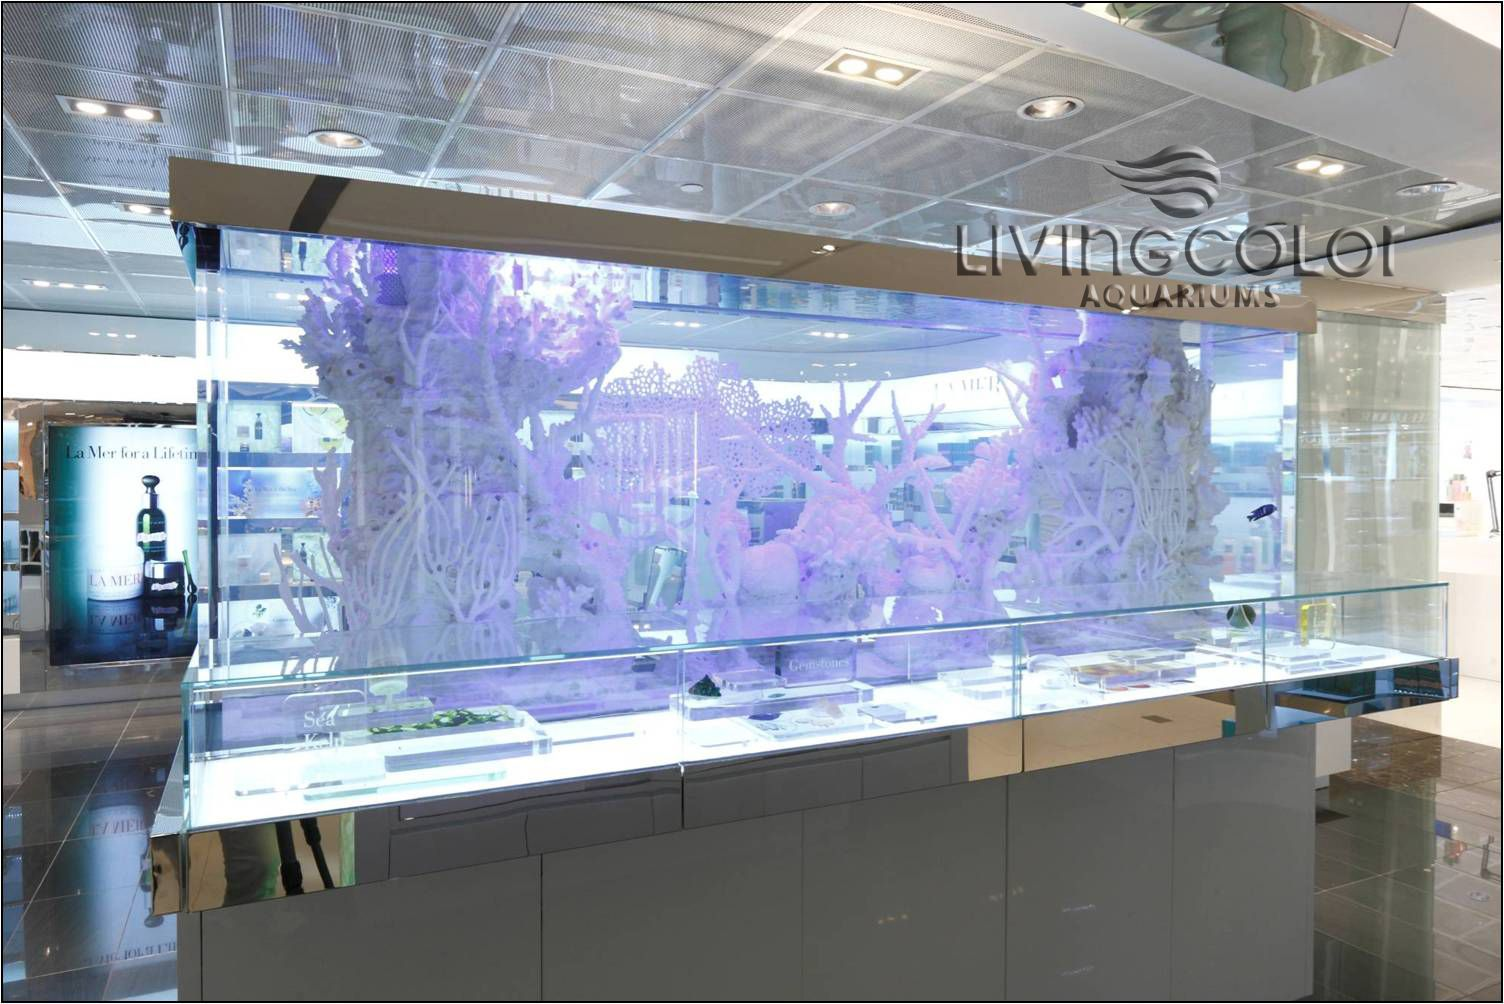 Fish tank dimensions - White Coral Fish Aquarium La Mer Locations Worldwide Dimensions X X 250 Gallons